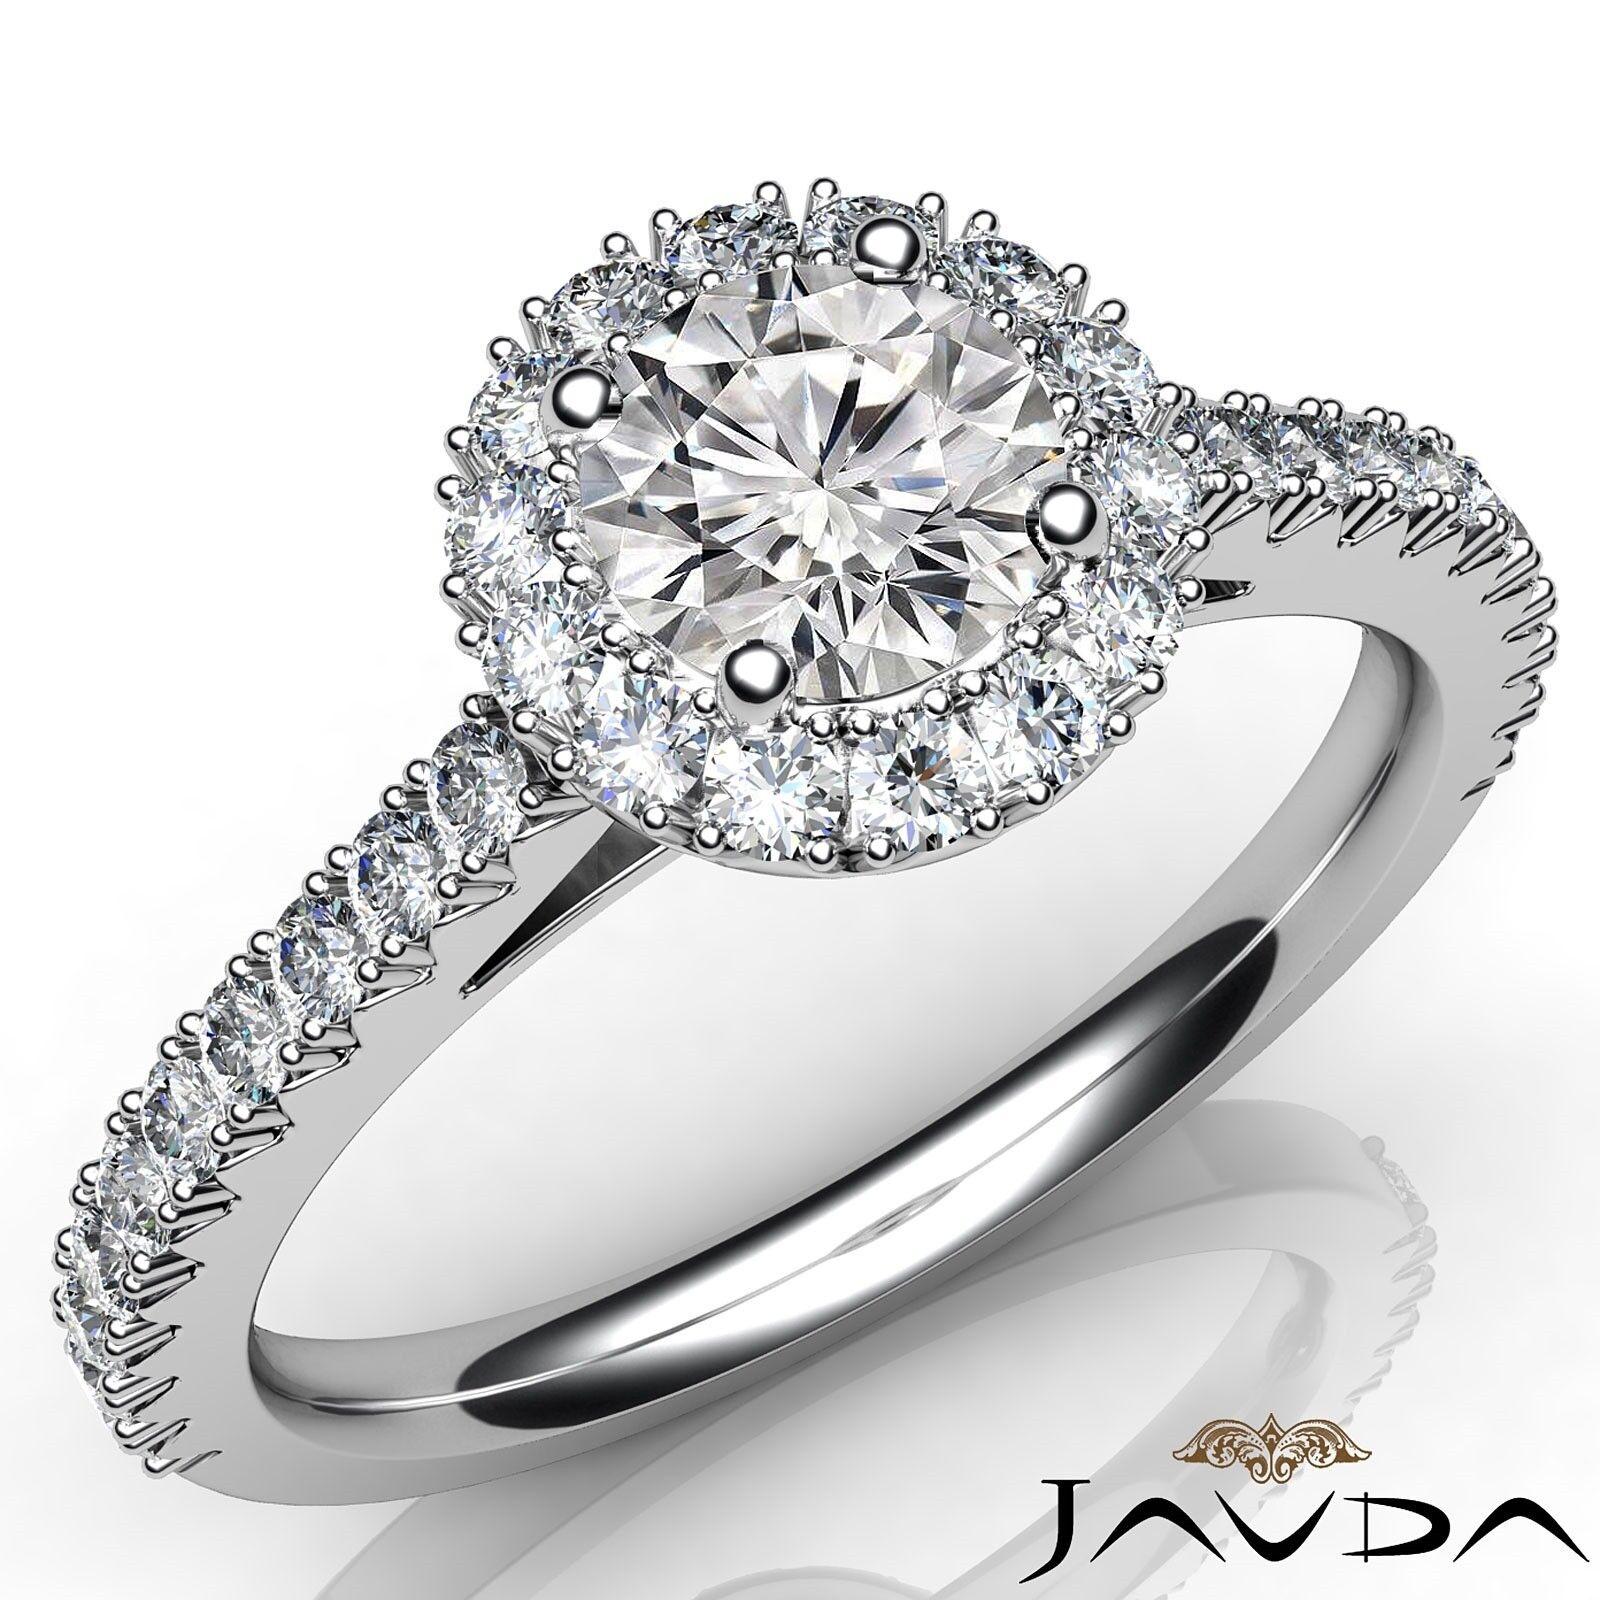 1.45ctw Comfort Fit Round Diamond Engagement Ring GIA E-VS1 White Gold Women New